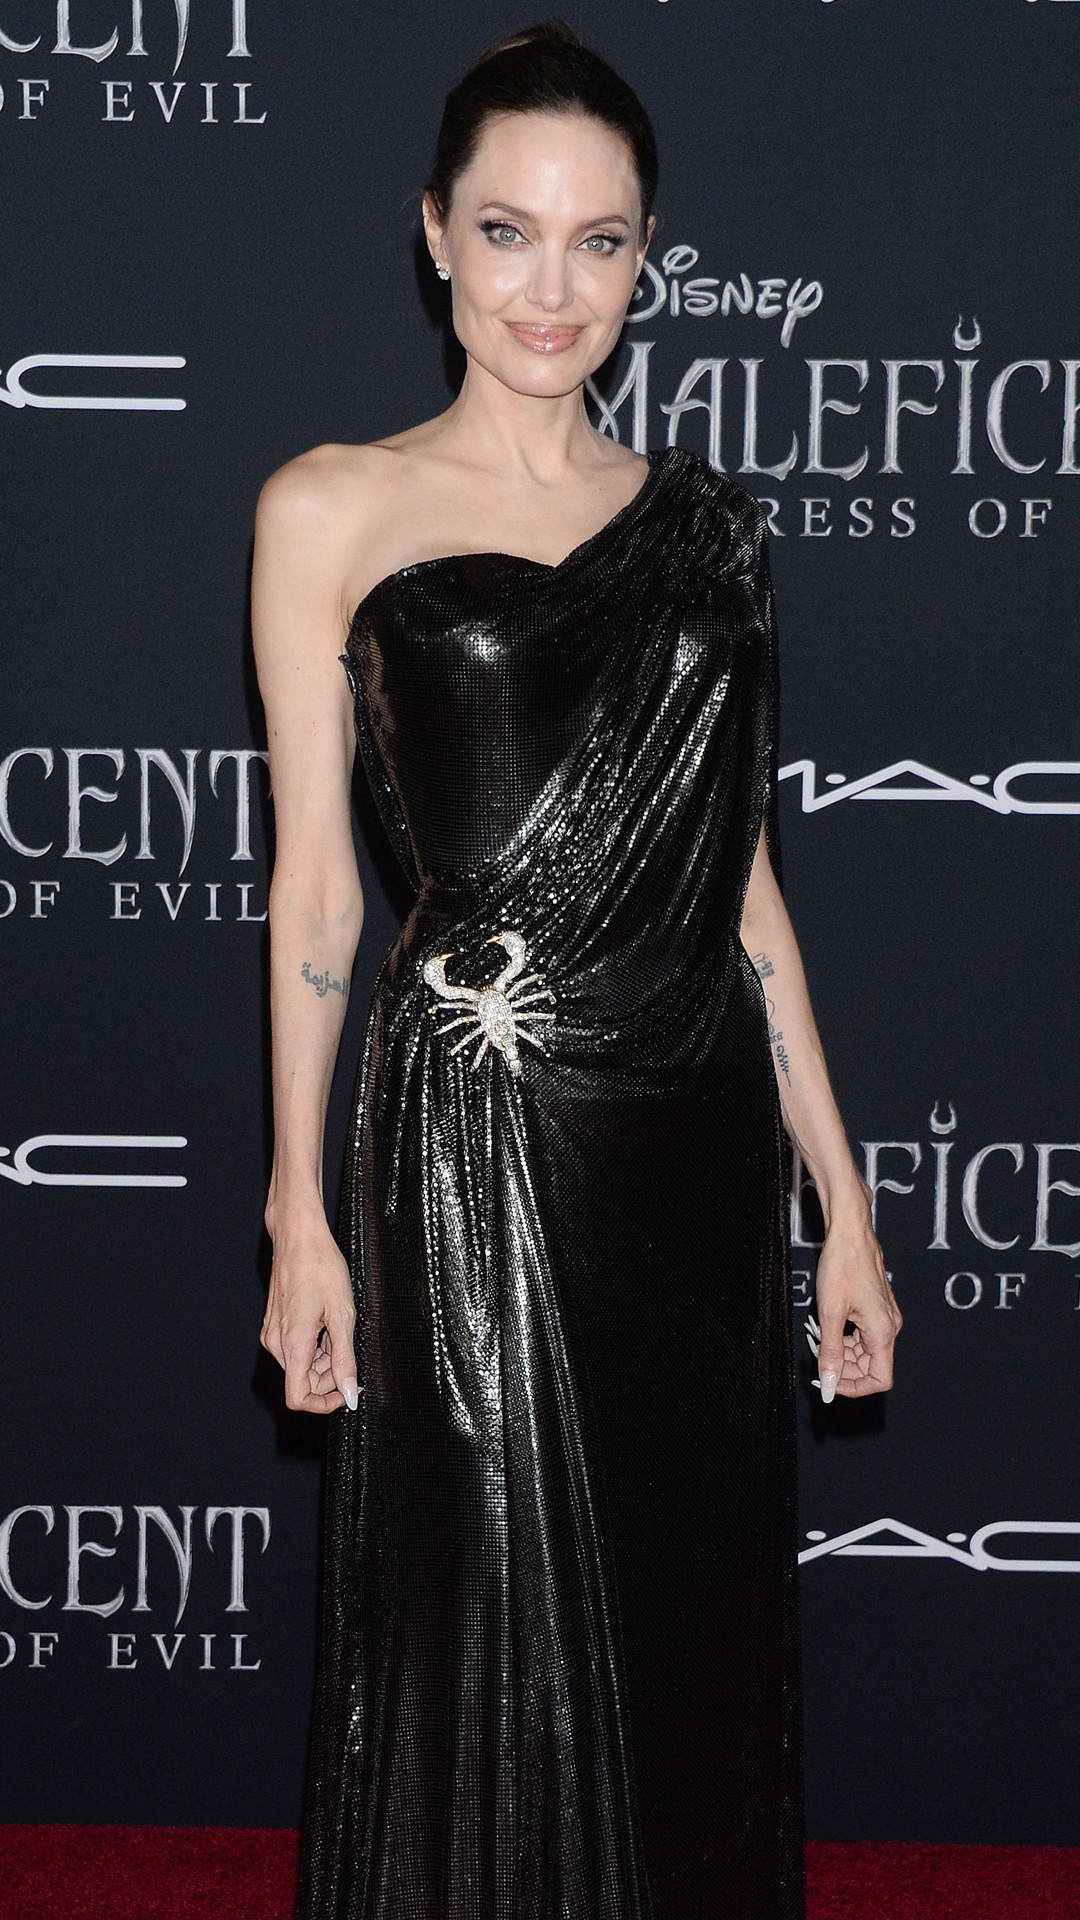 Angelina Jolie, Maleficient 2 Premiere